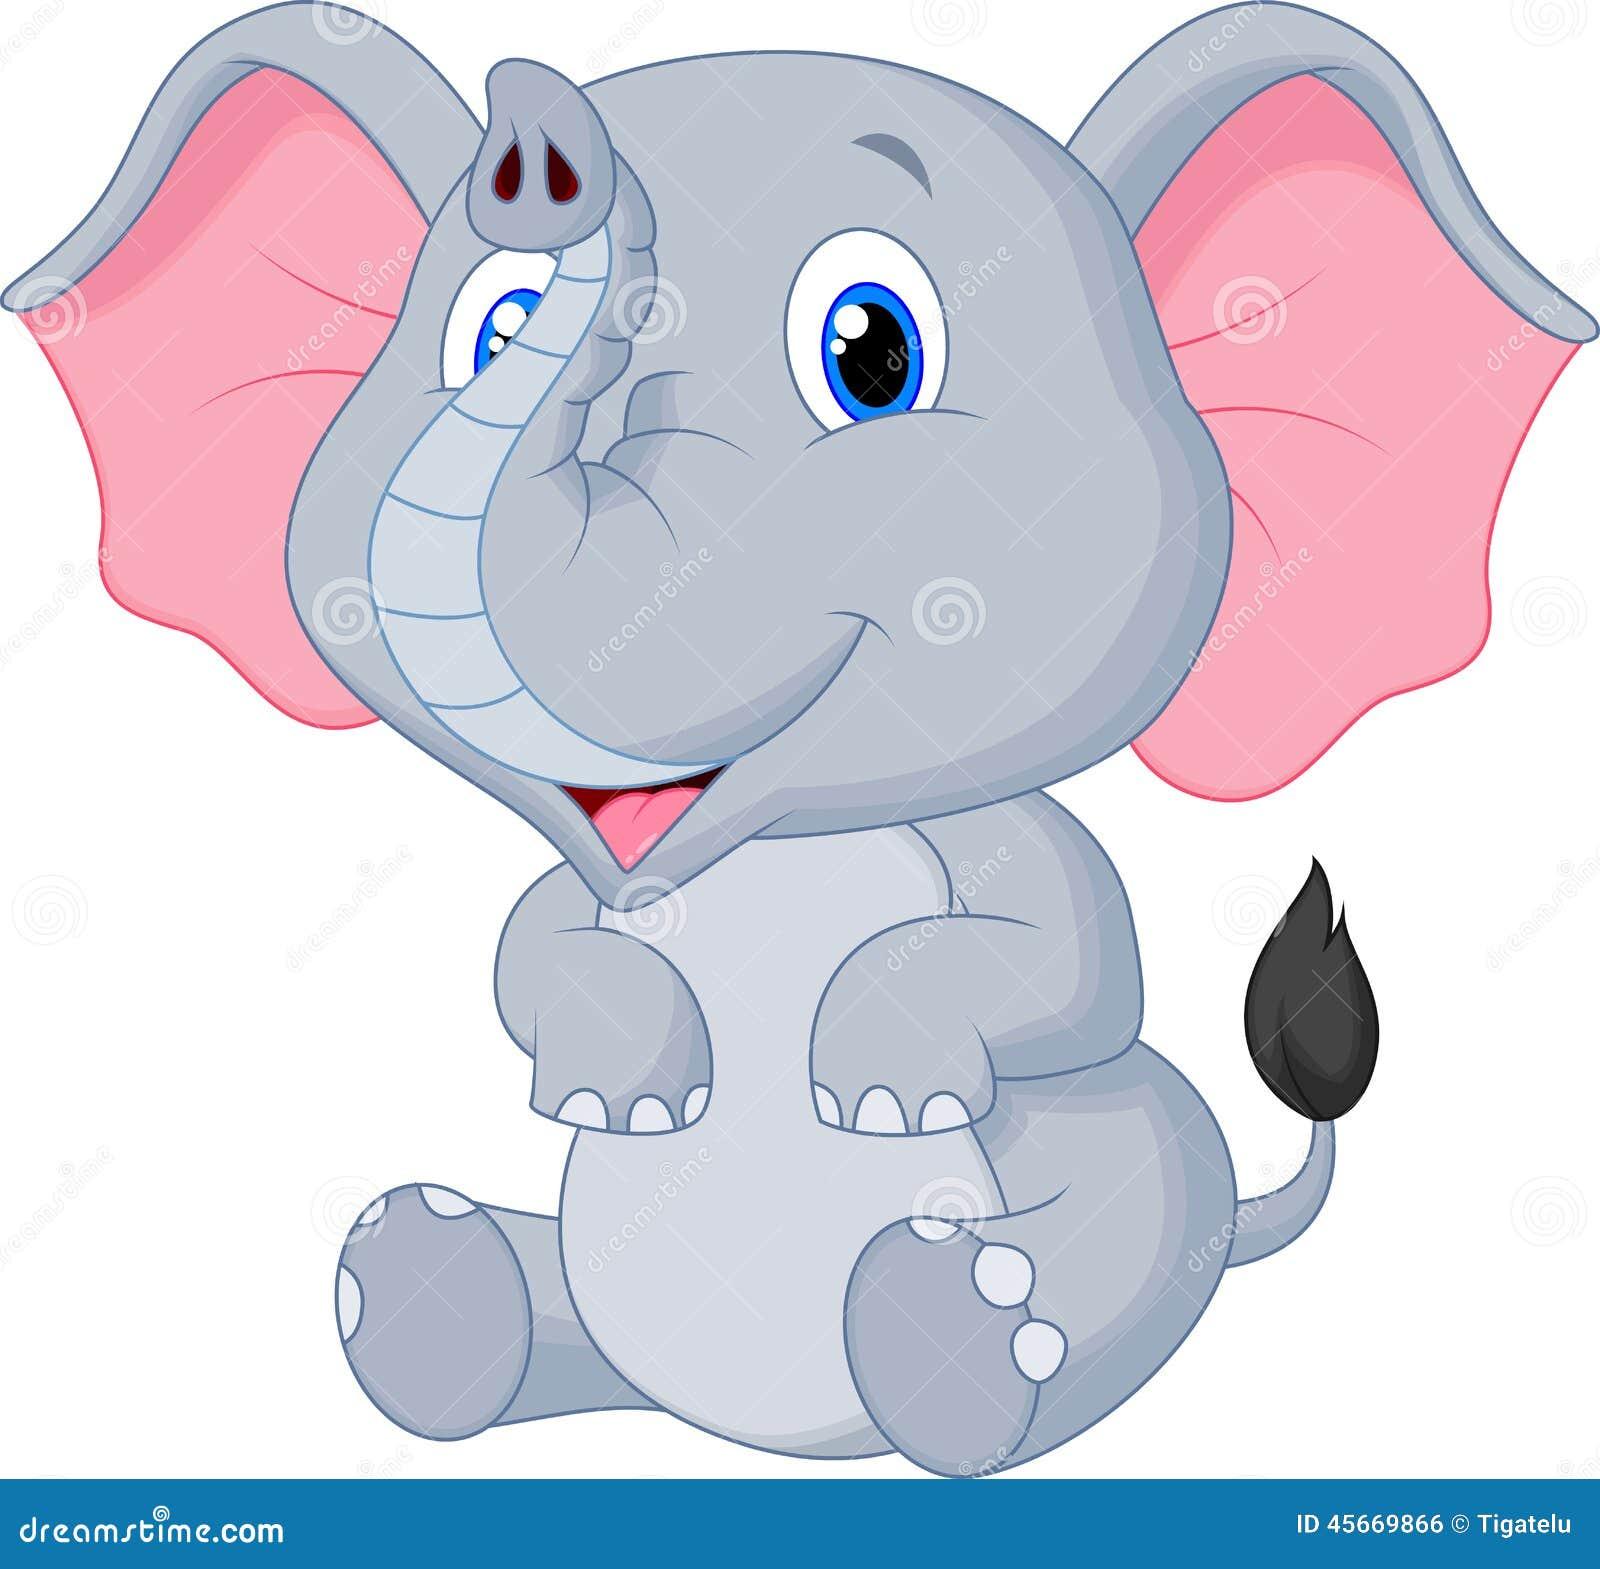 Cute Cartoon Elephant Drawings Male Models Picture